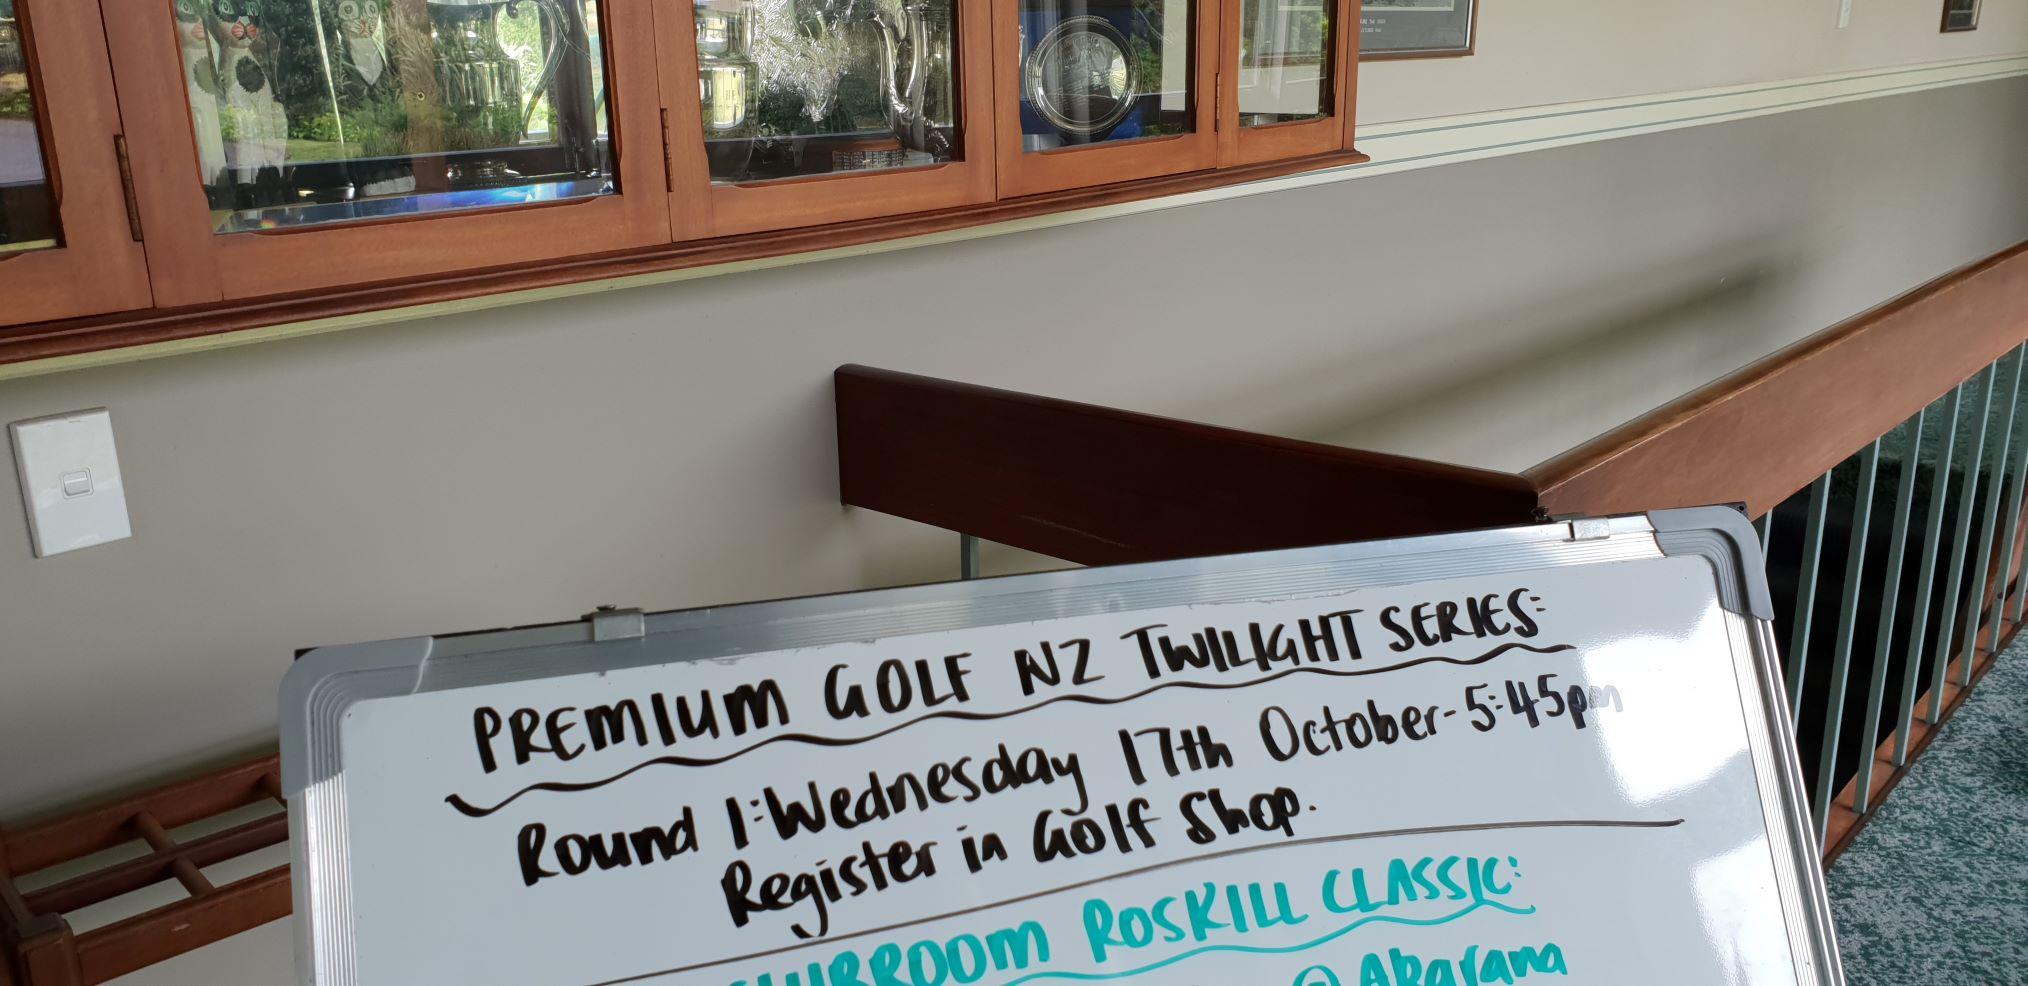 2018/2019 Premium golf nz twilight series notice in the maungakiekie Golf Club entrance hall